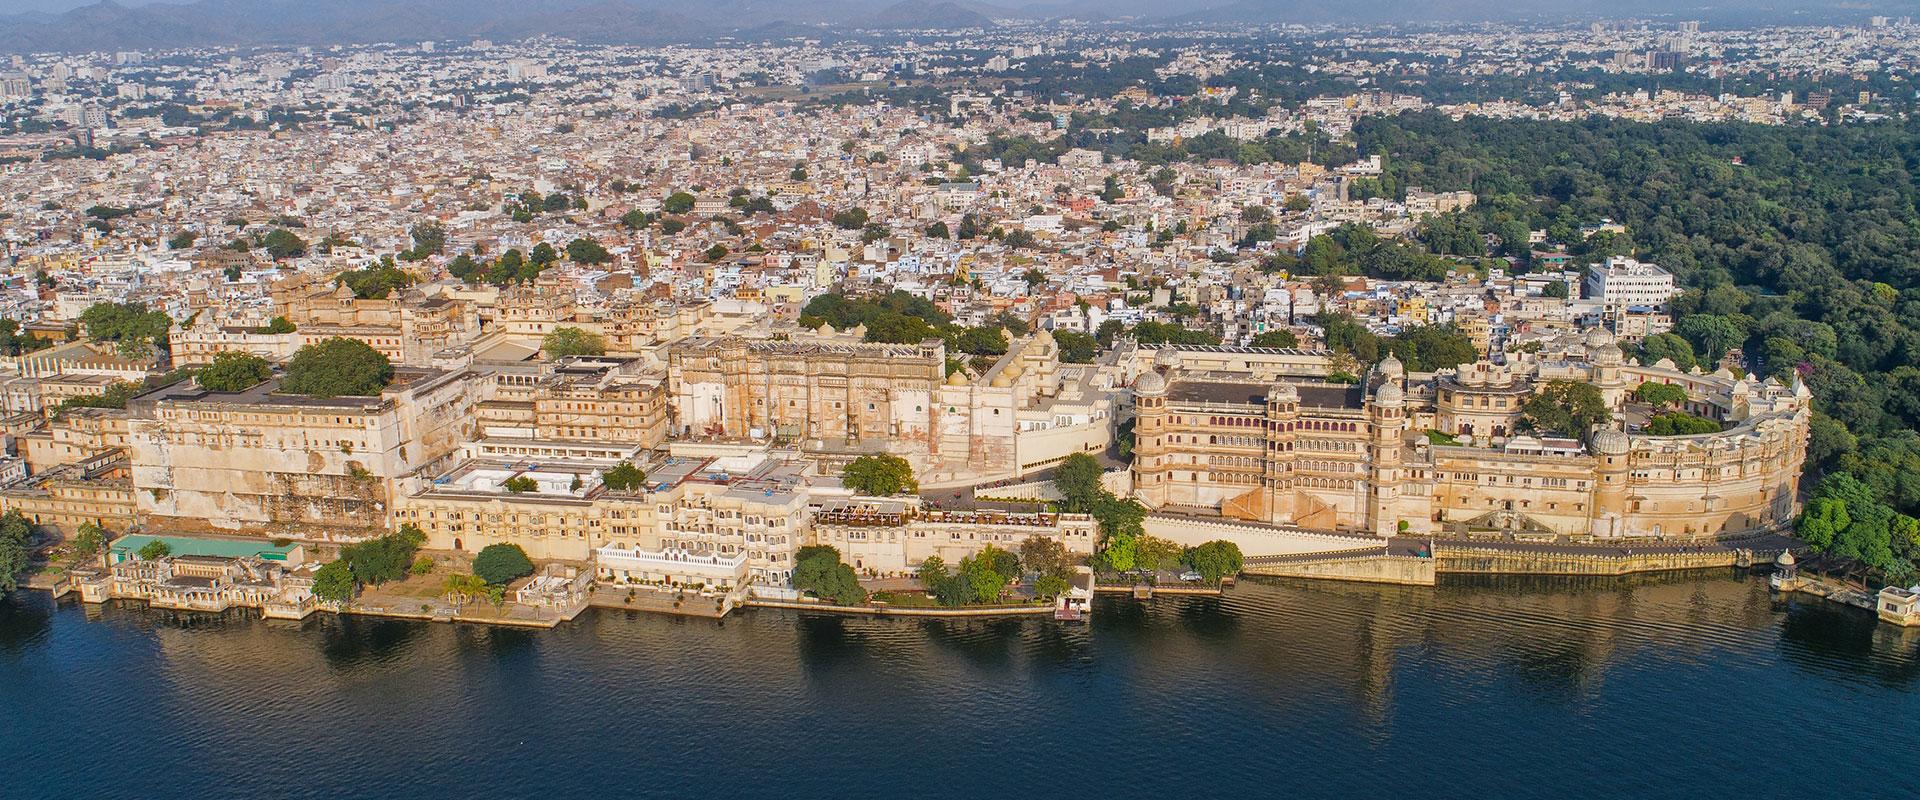 Royale Palace Of Udaipur | Eternal Mewar